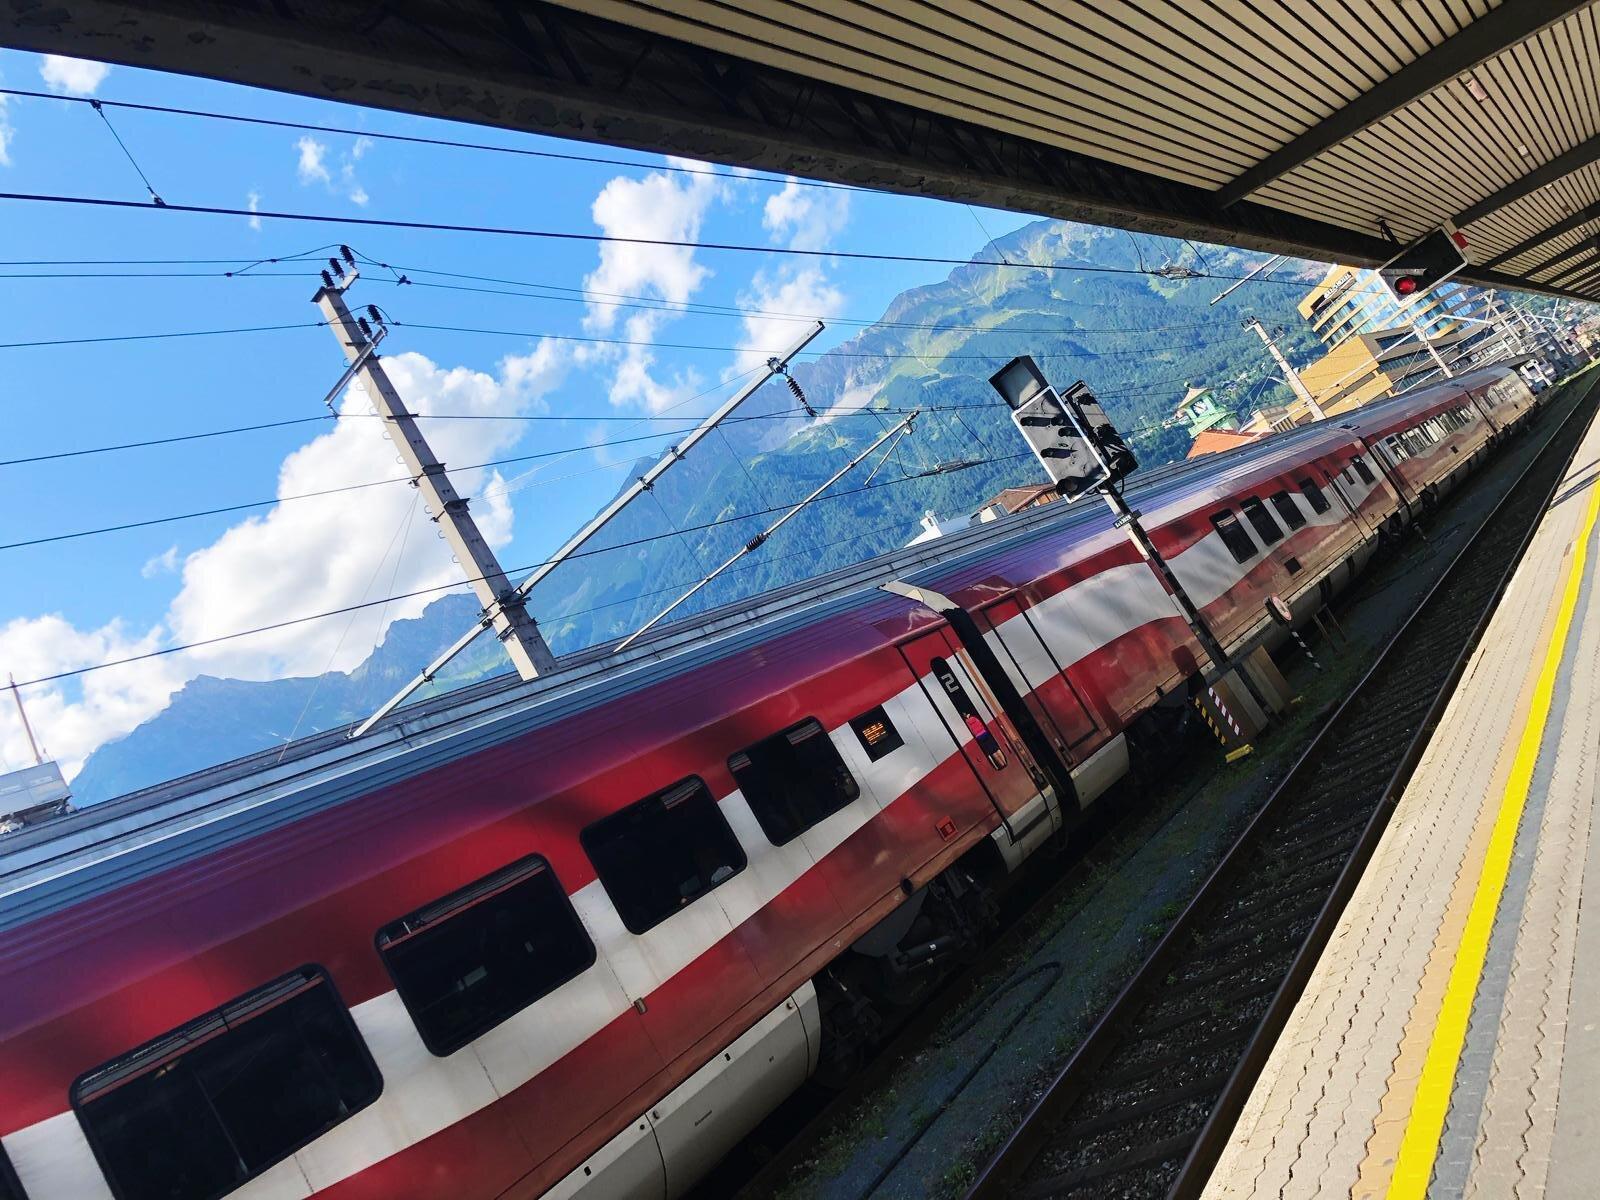 Train station in Innsbruck.